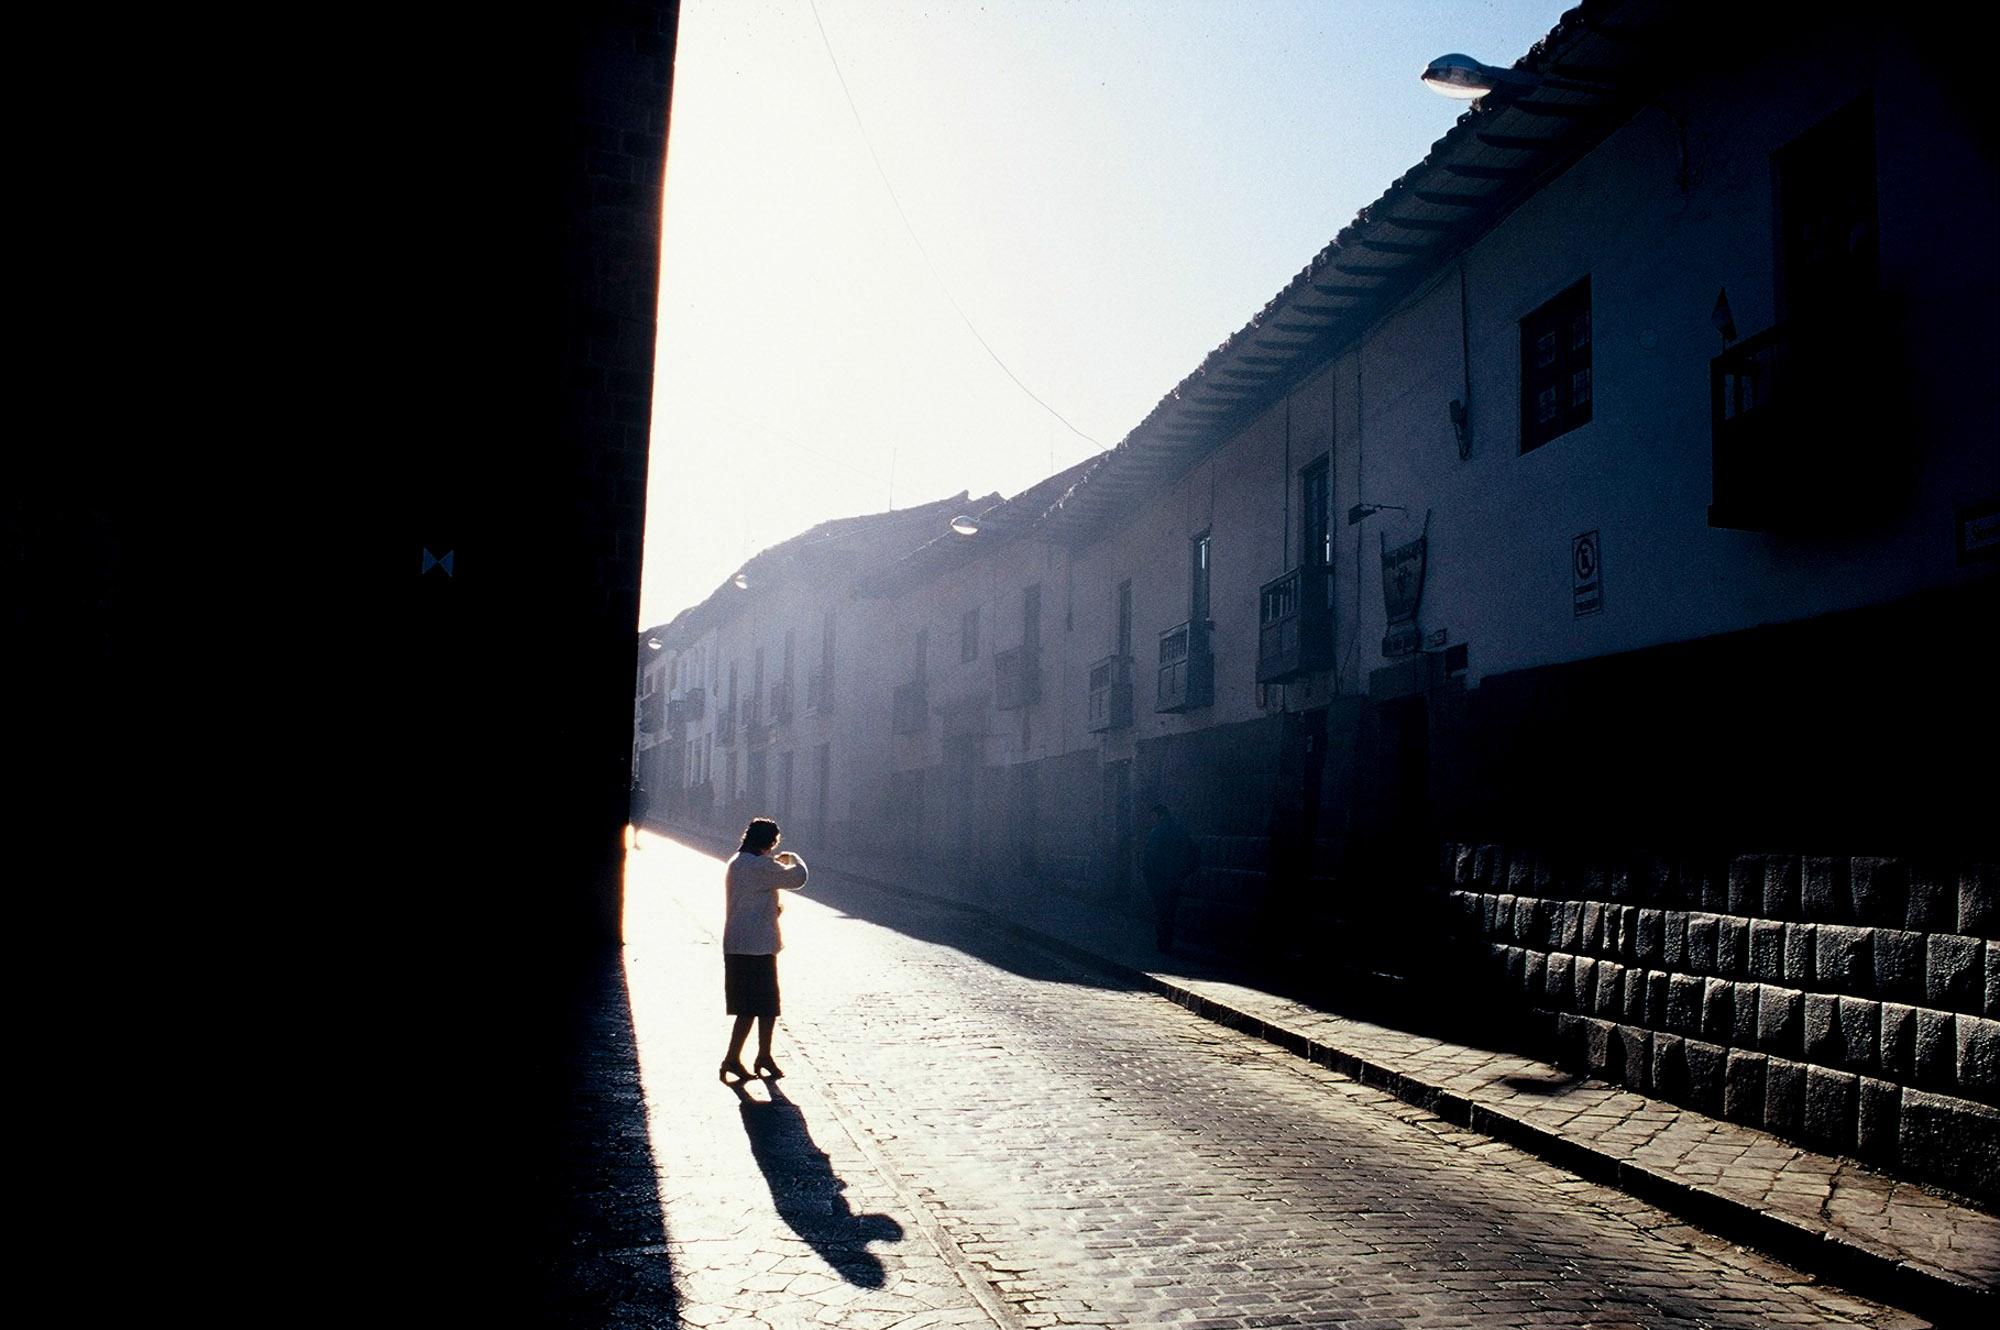 travel-photographer-oxford-london-jonathan-self-photography-2.jpg